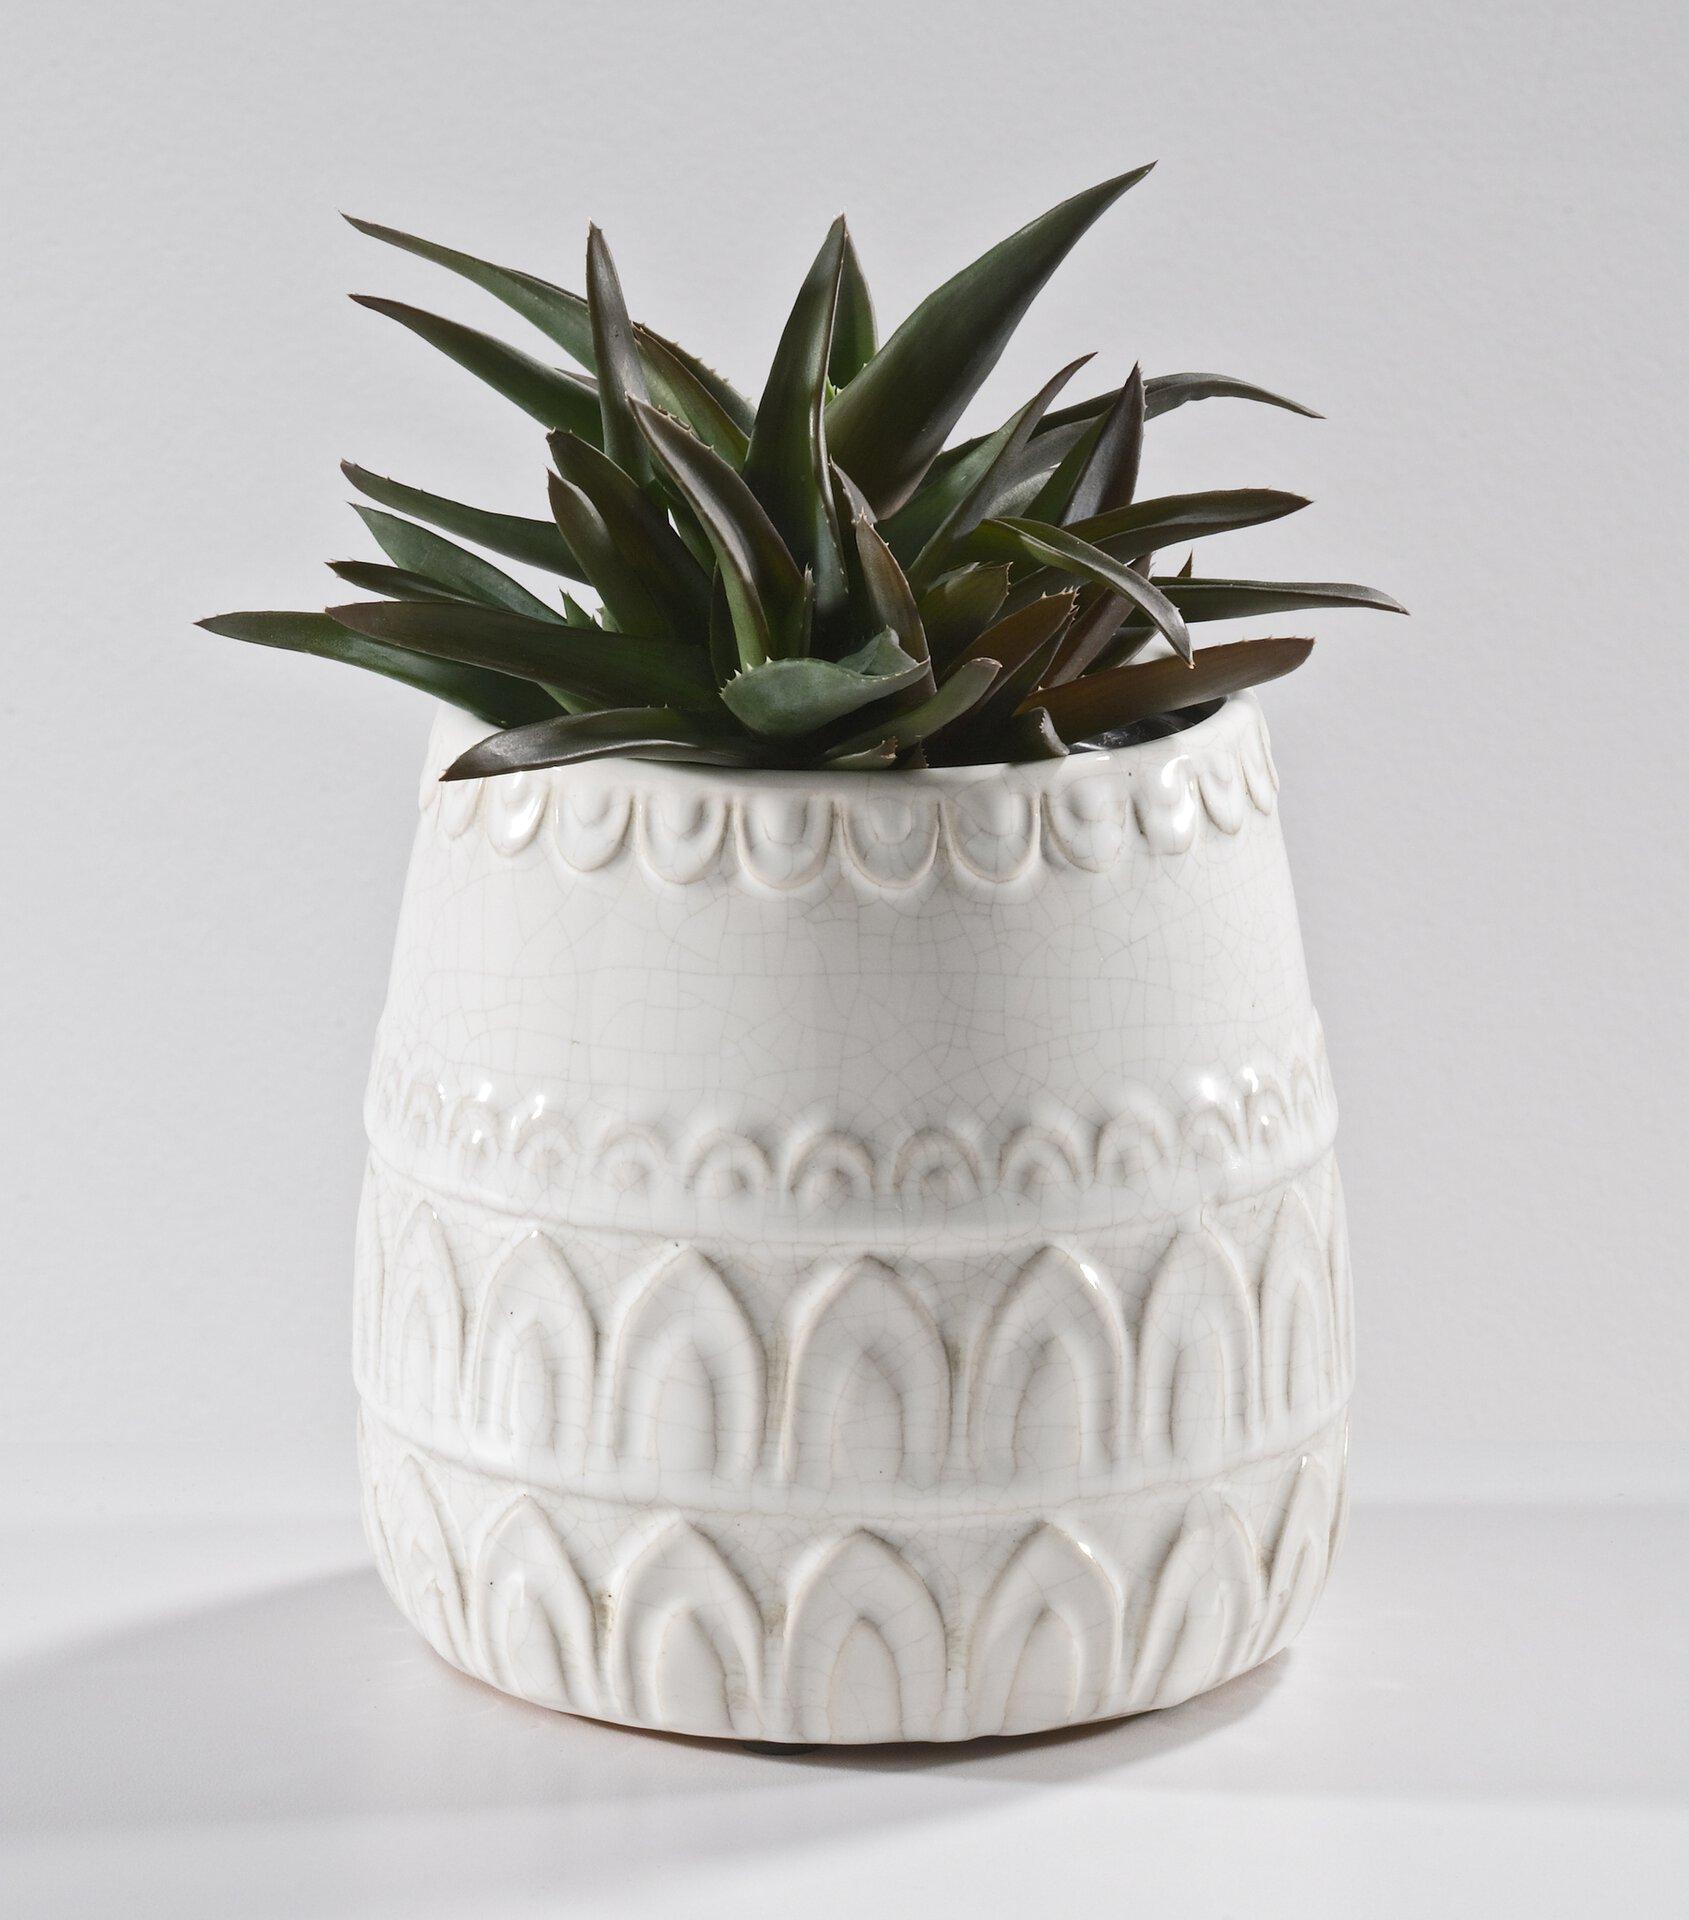 Vase 185109 Casa Nova Keramik weiß 16 x